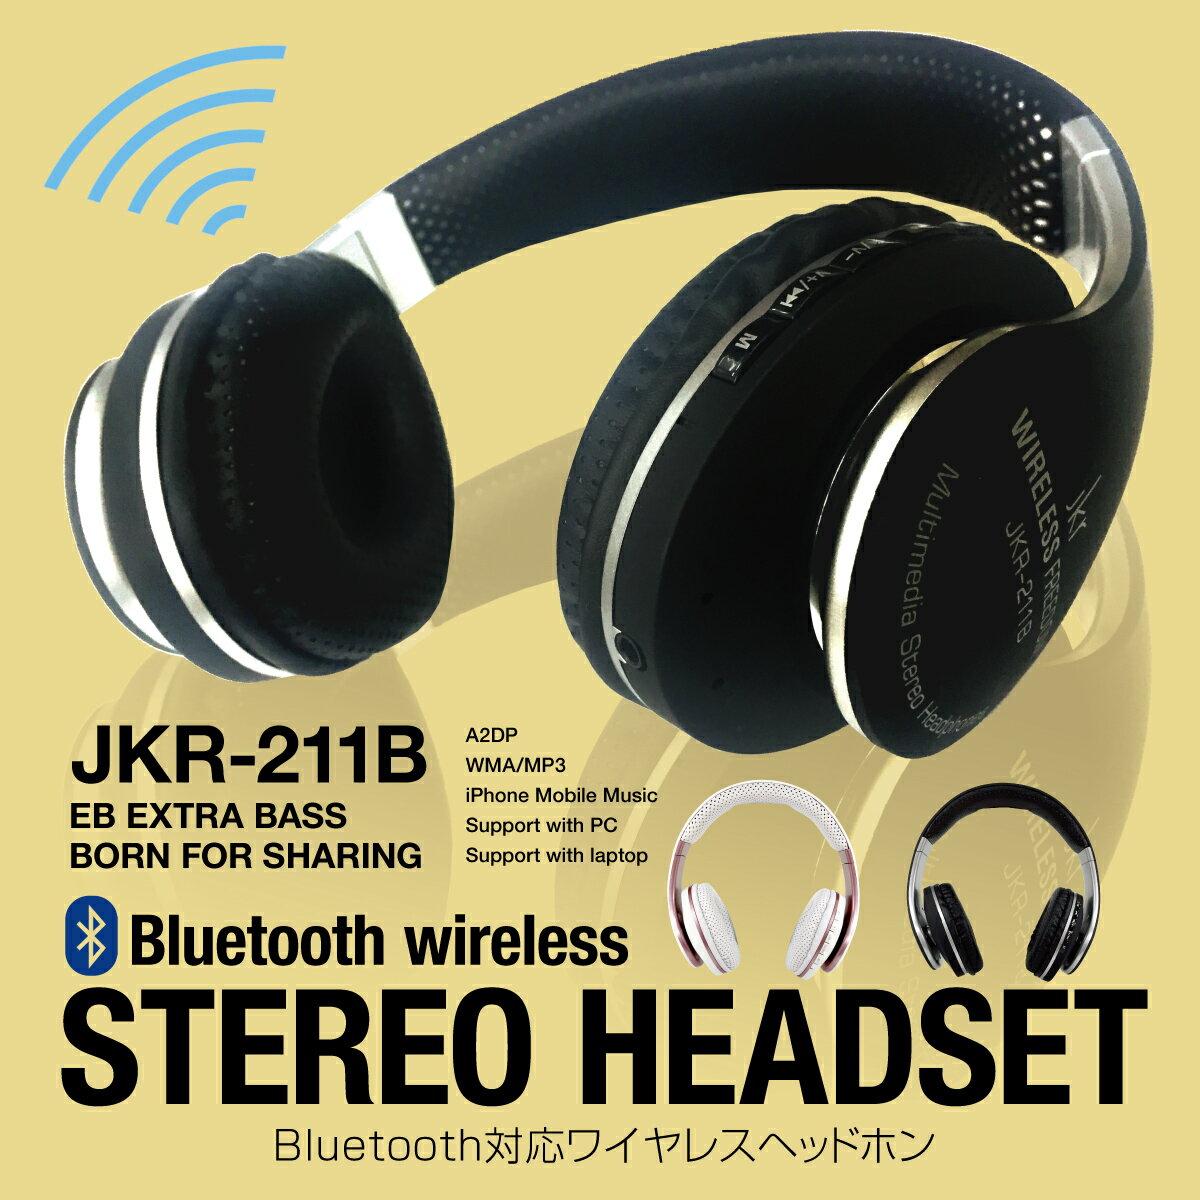 Bluetooth ワイヤレスヘッドホン ワイヤレスヘッドセット ヘッドセット イヤホンマイク ハンズフリーヘッドセット ワイヤレス ヘッドホン 送料無料 jkr-headset